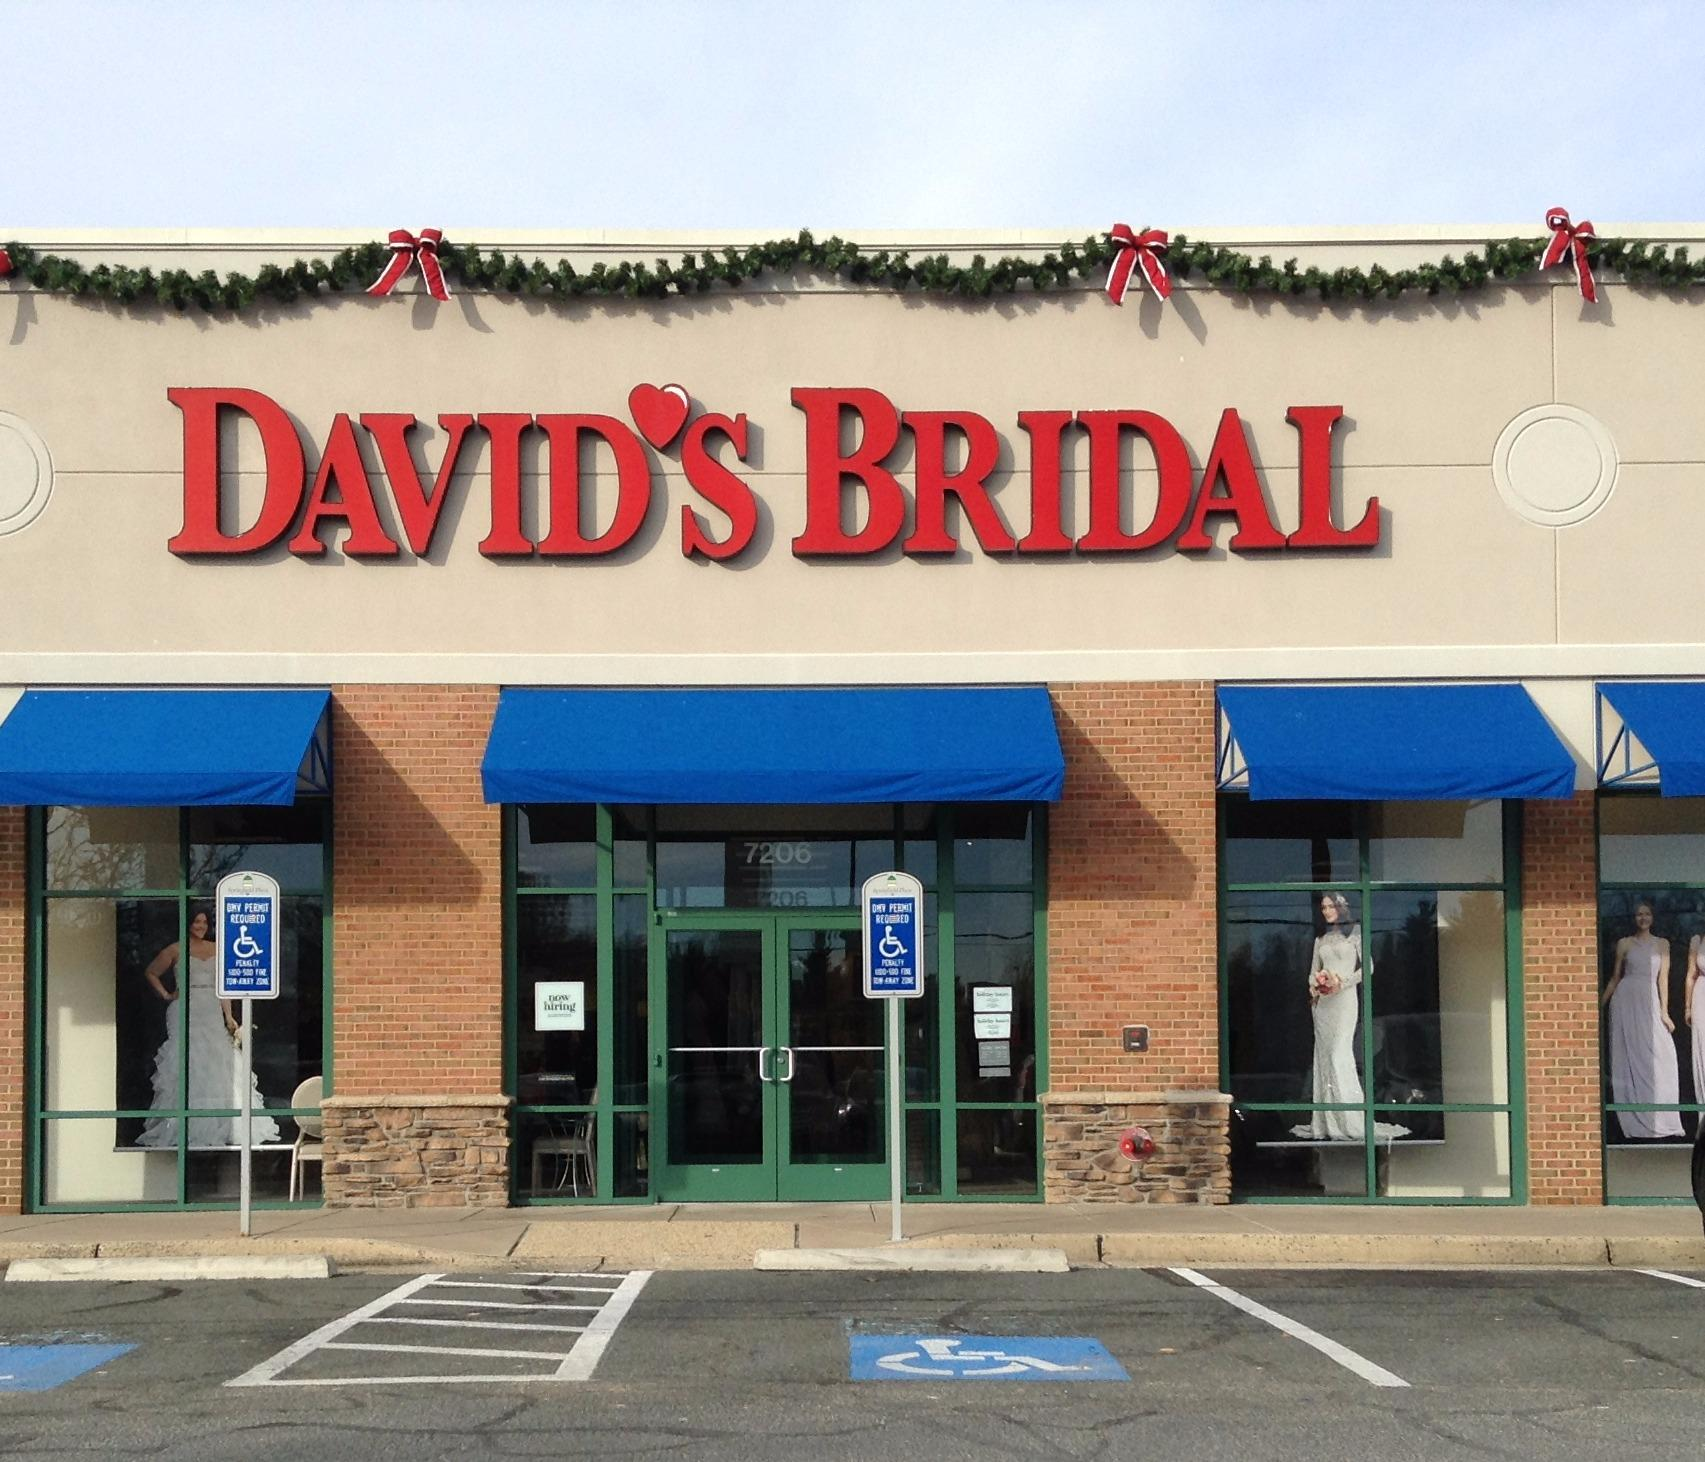 David's Bridal image 5